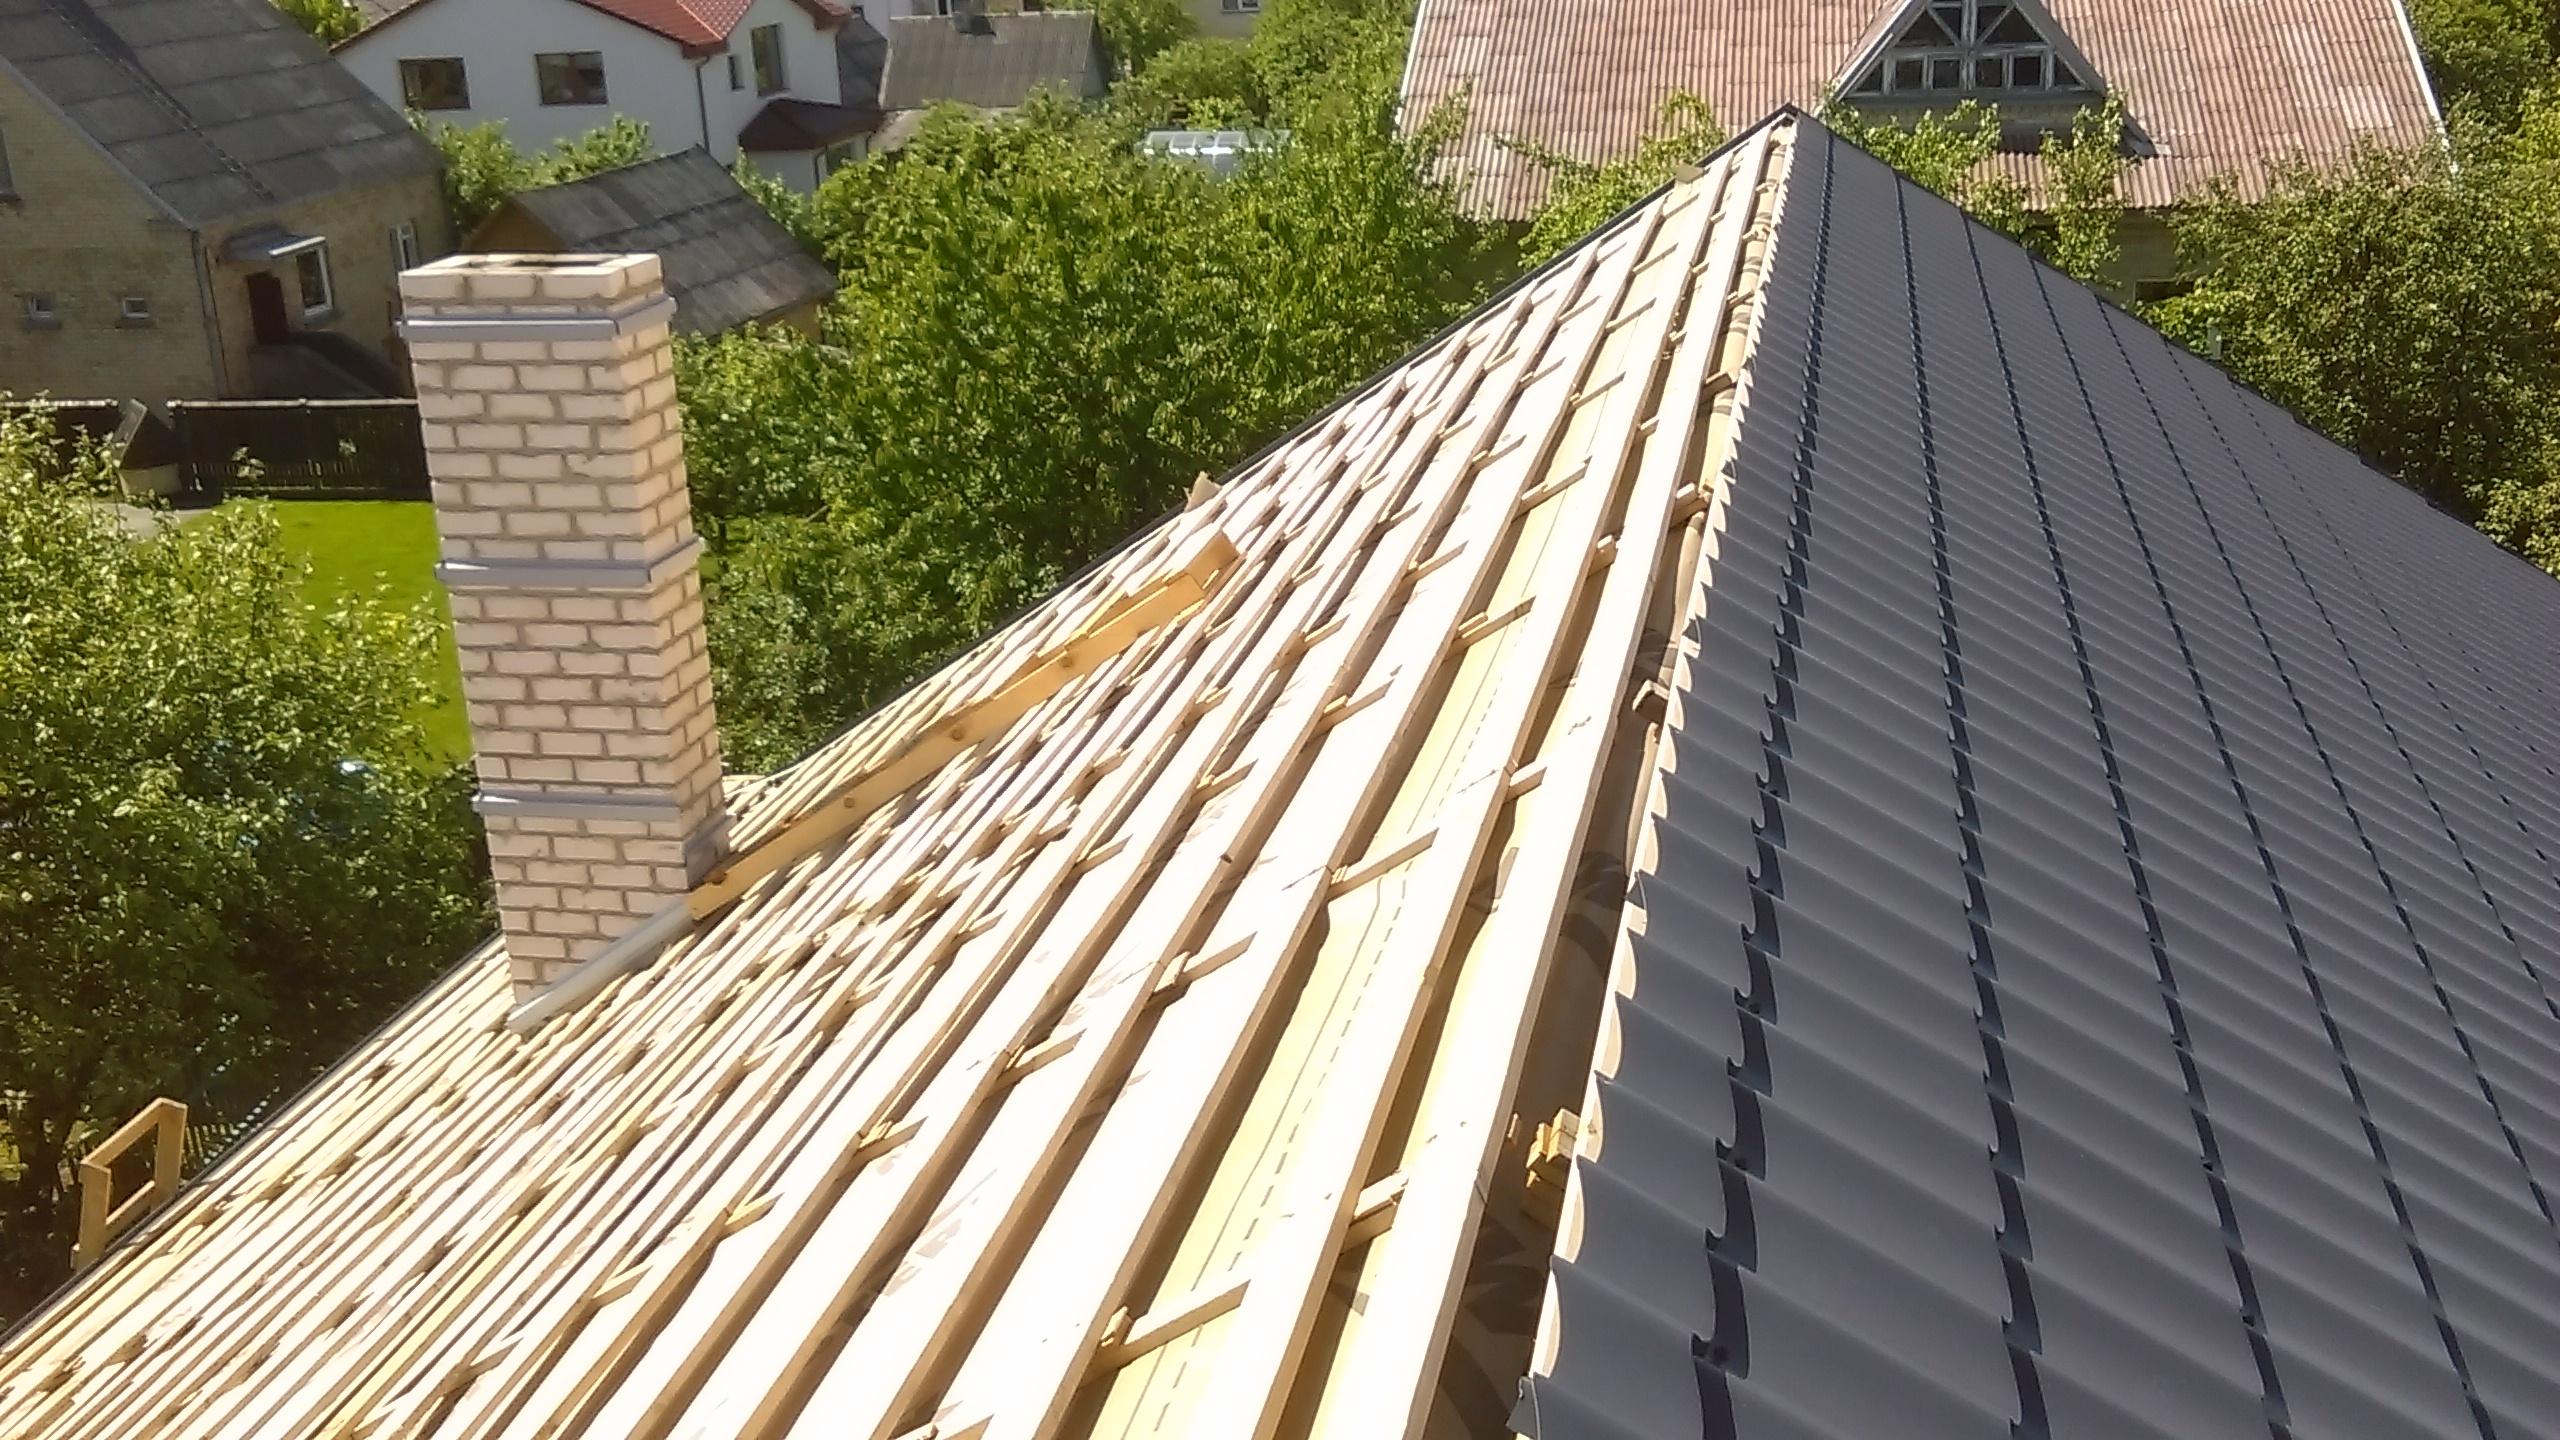 Kuo ypatingi Lietuvos pastatų stogai ?